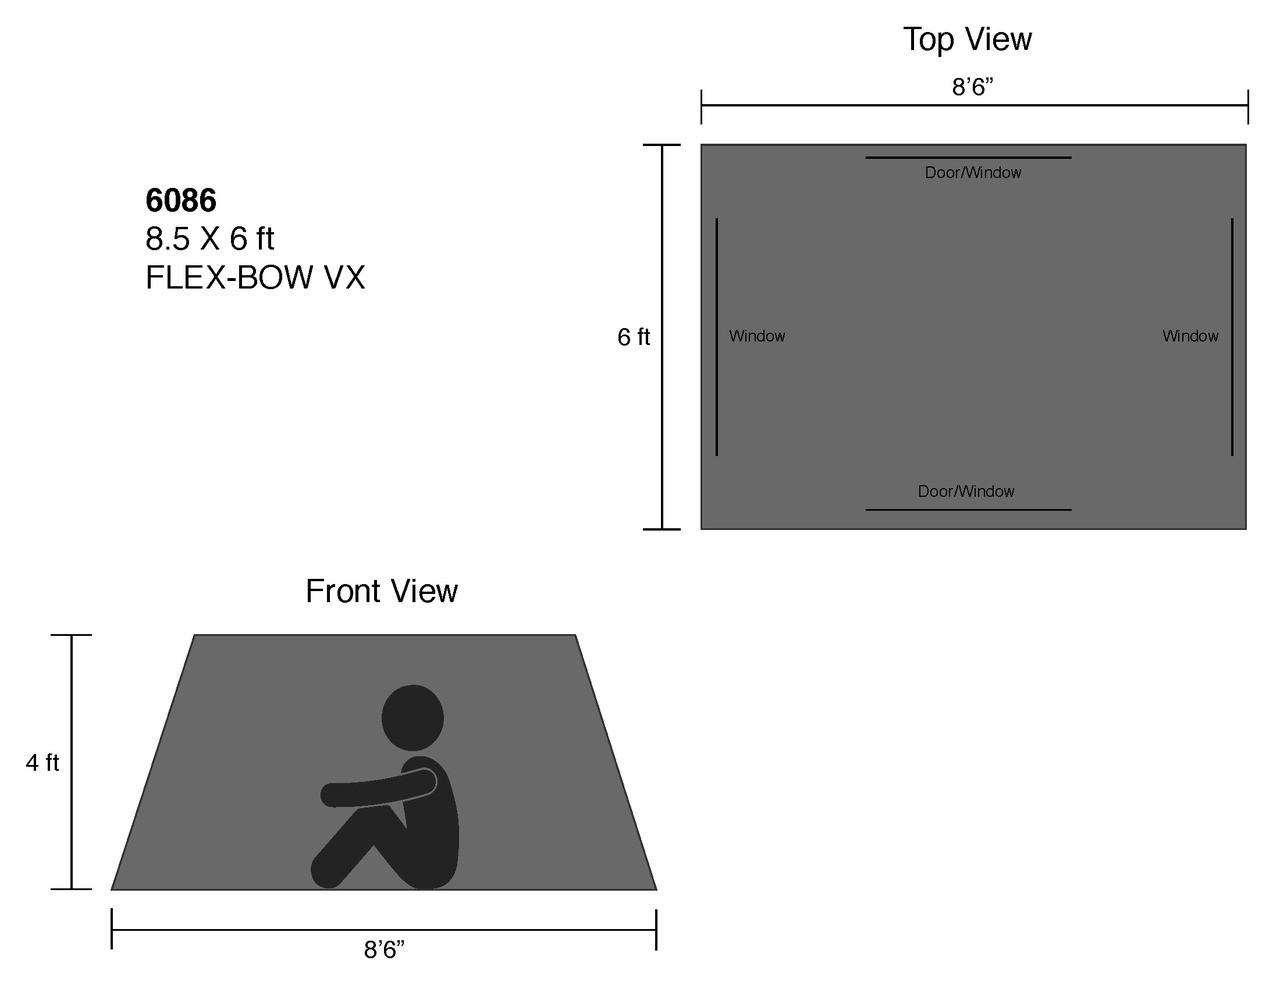 8.5 x 6 ft. Flex-Bow VX Tent - Estimated Restock Date Nov. 1st, 2021